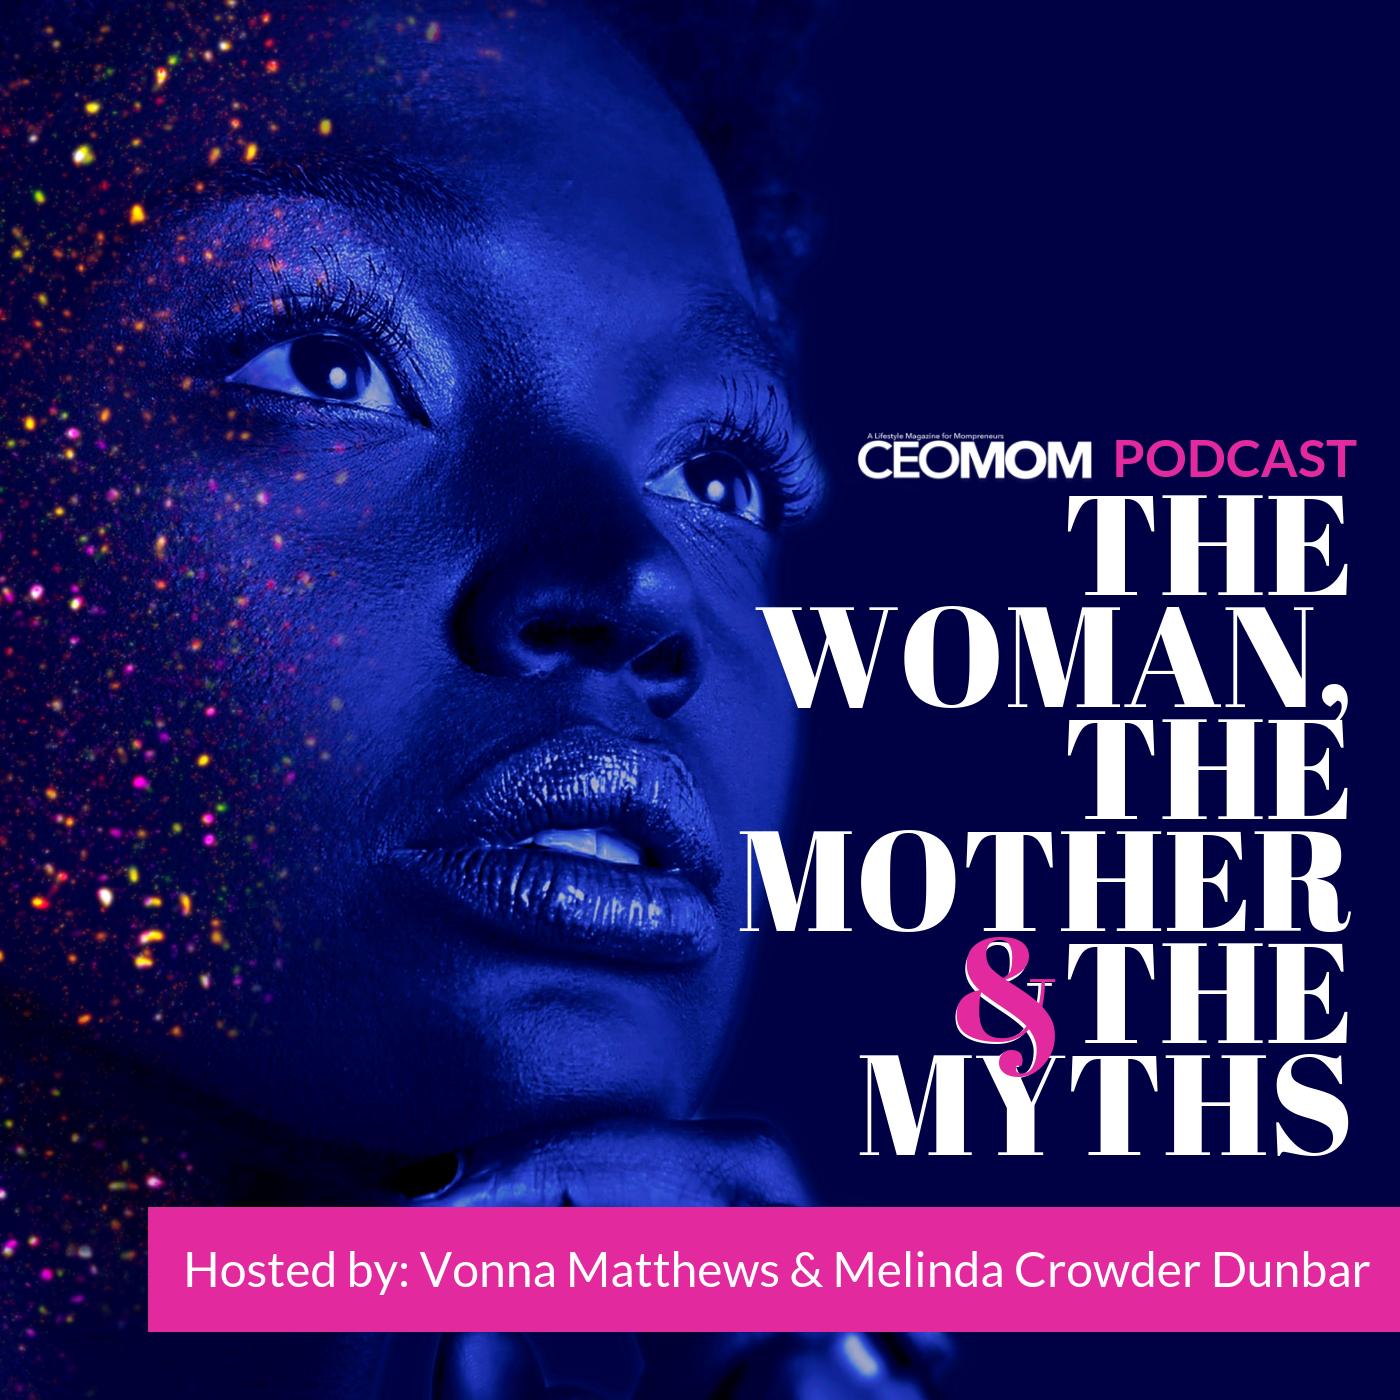 CEOMOM Podcast